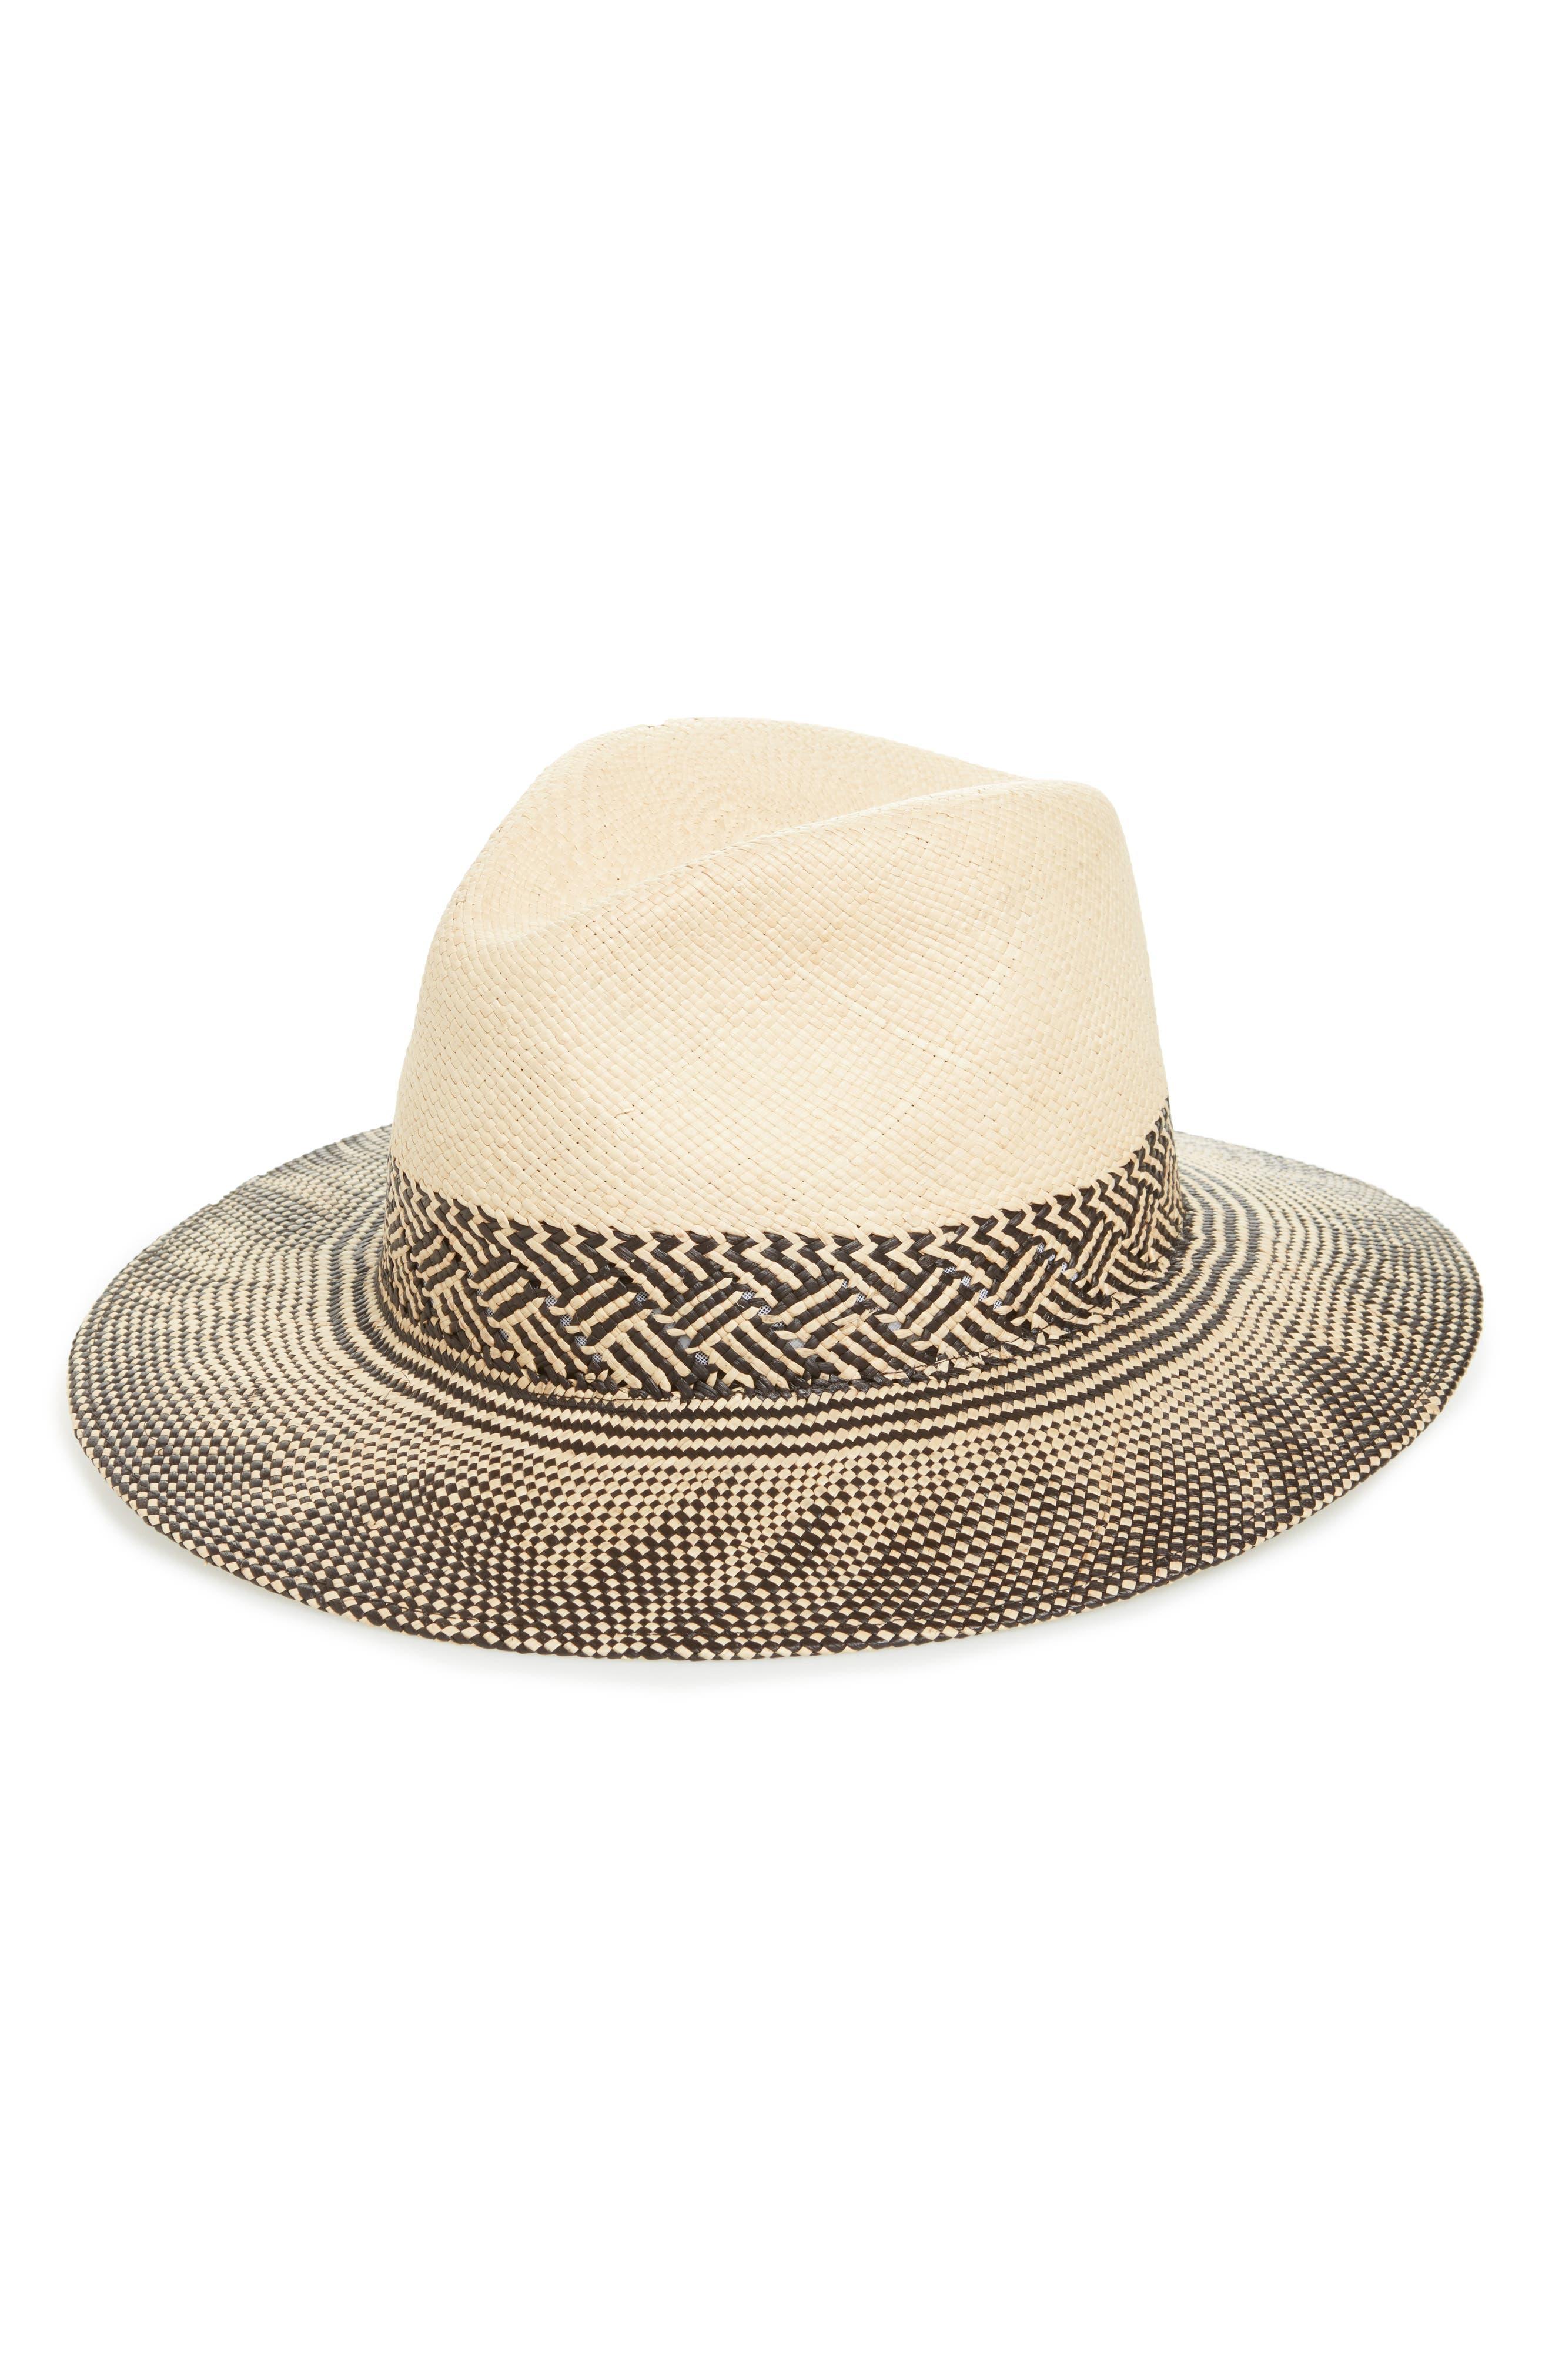 Main Image - rag & bone Straw Panama Hat